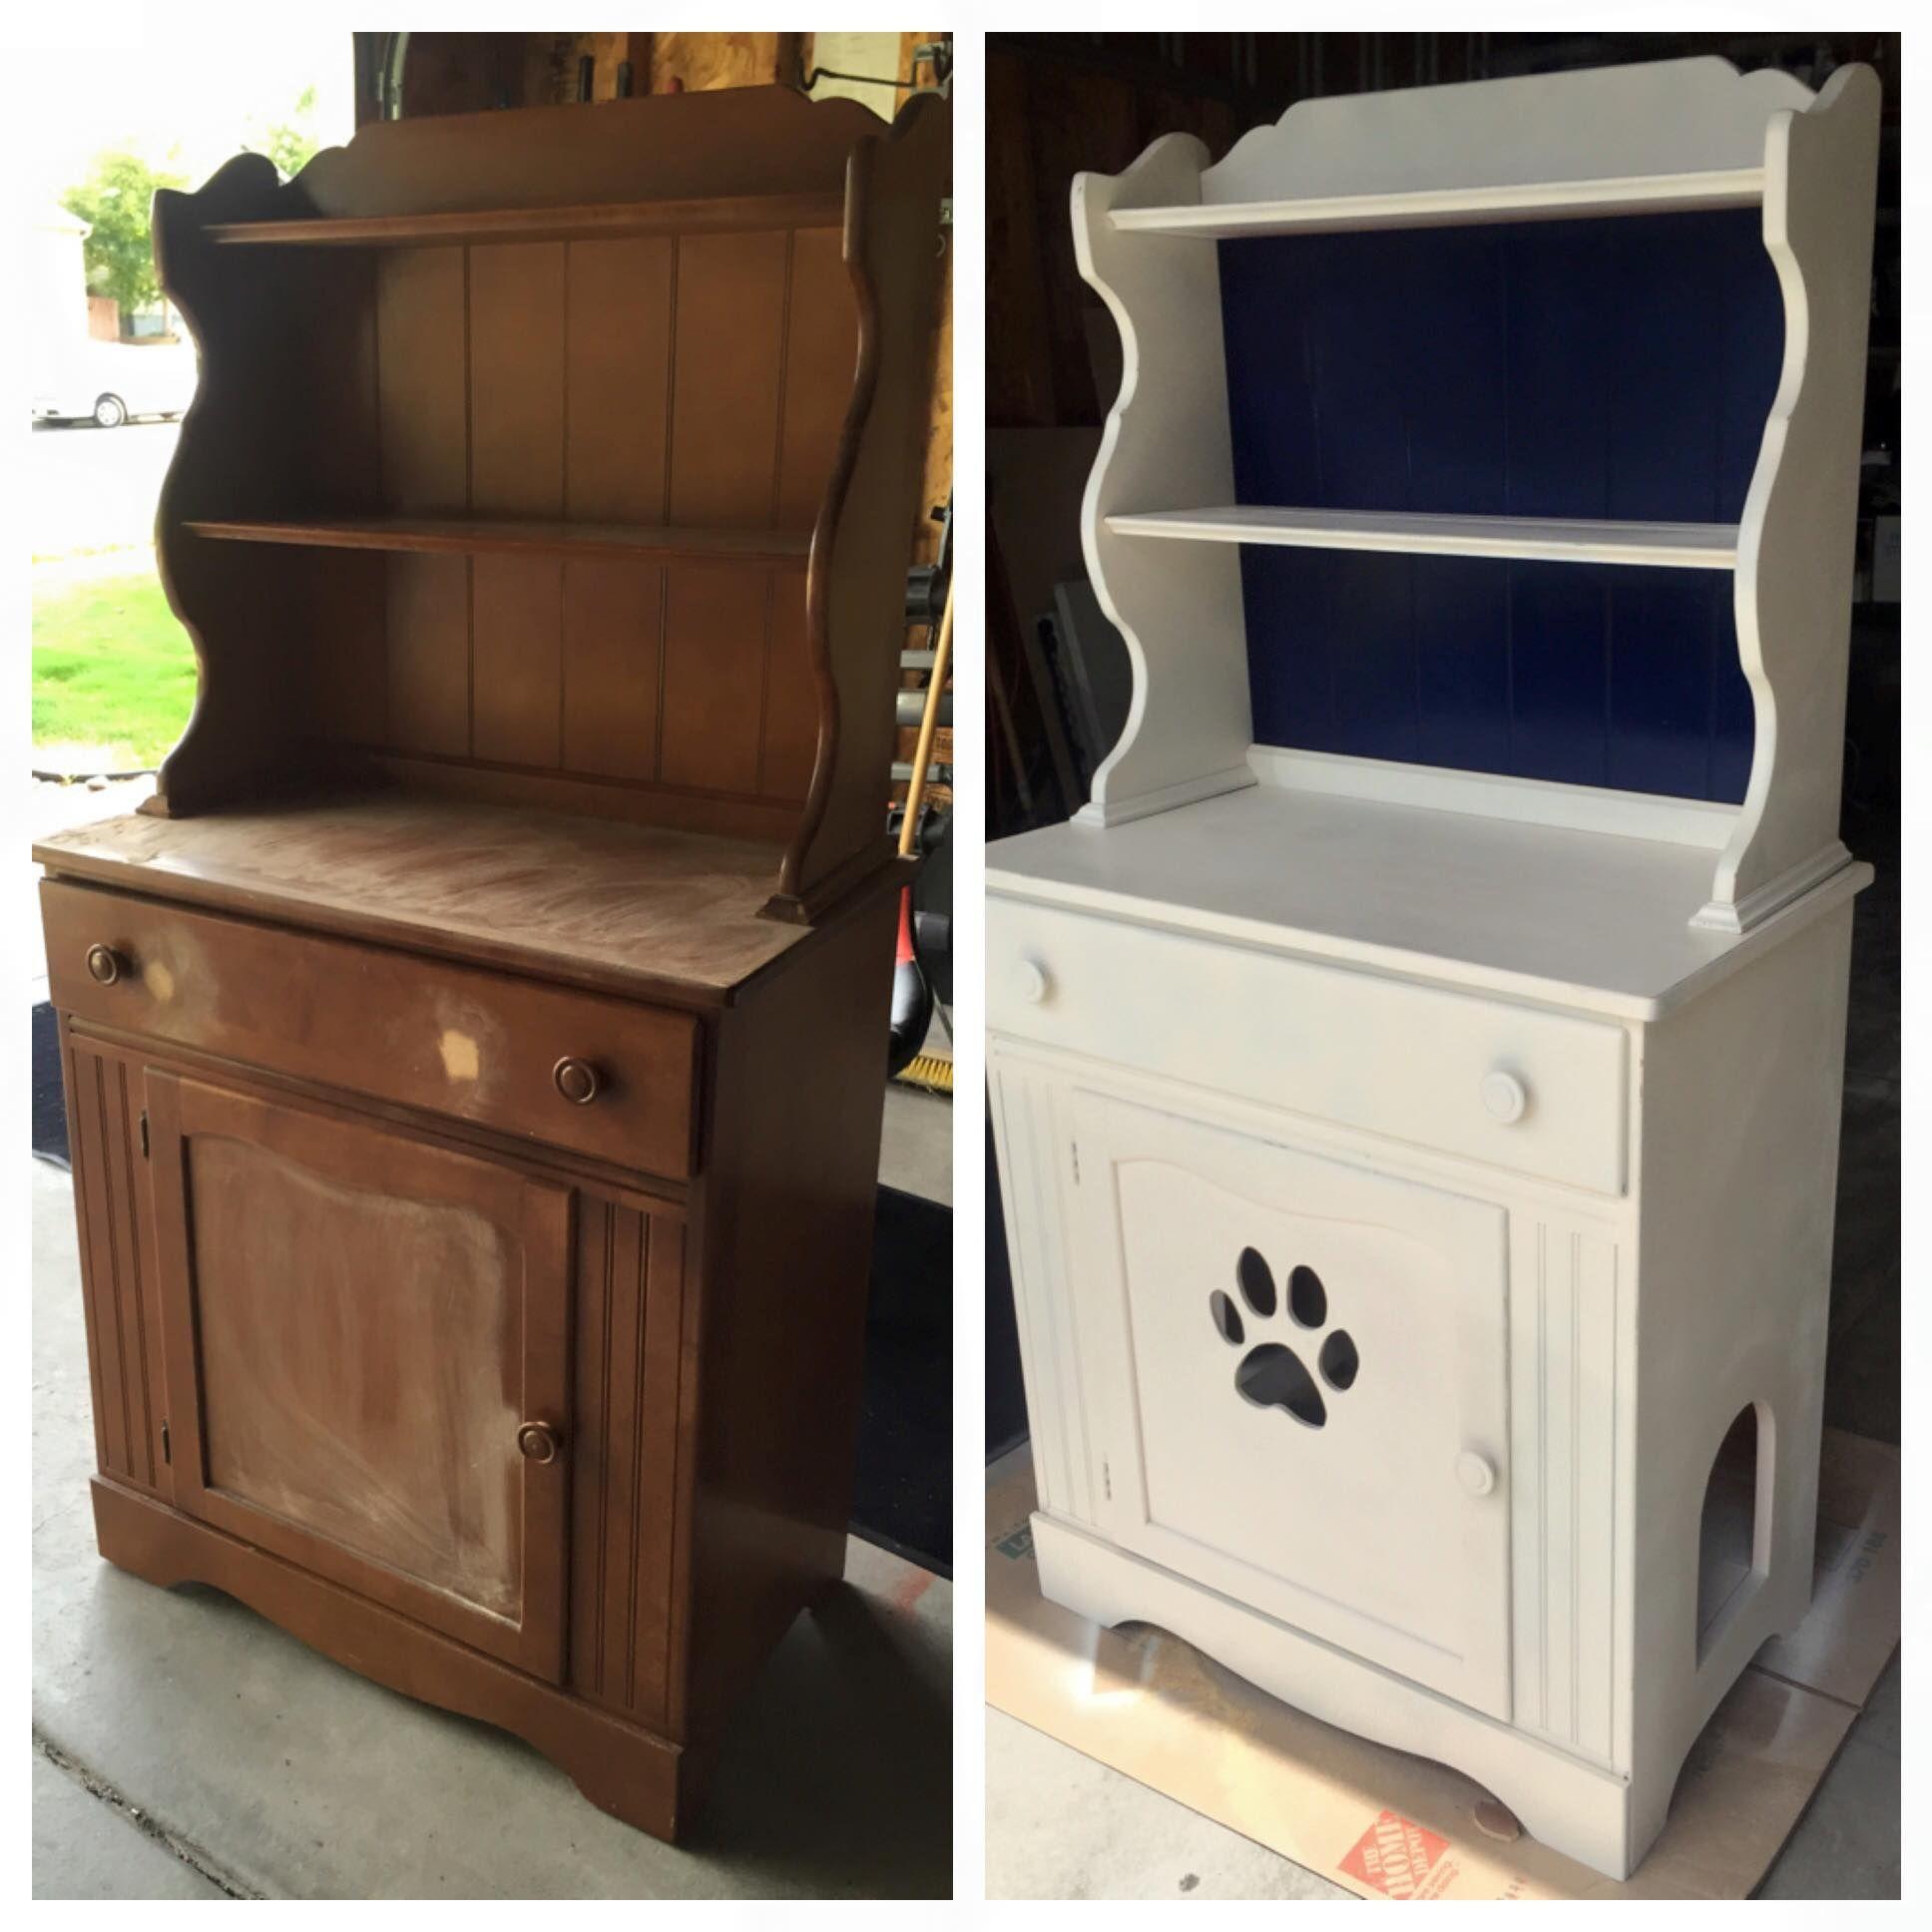 cat litter box furniture diy. DIY Refurbished A Cabinet To Hide The #cat #litter Box. ~ Just Photo But I\u0027m Loving Look Of This! Cat Litter Box Furniture Diy